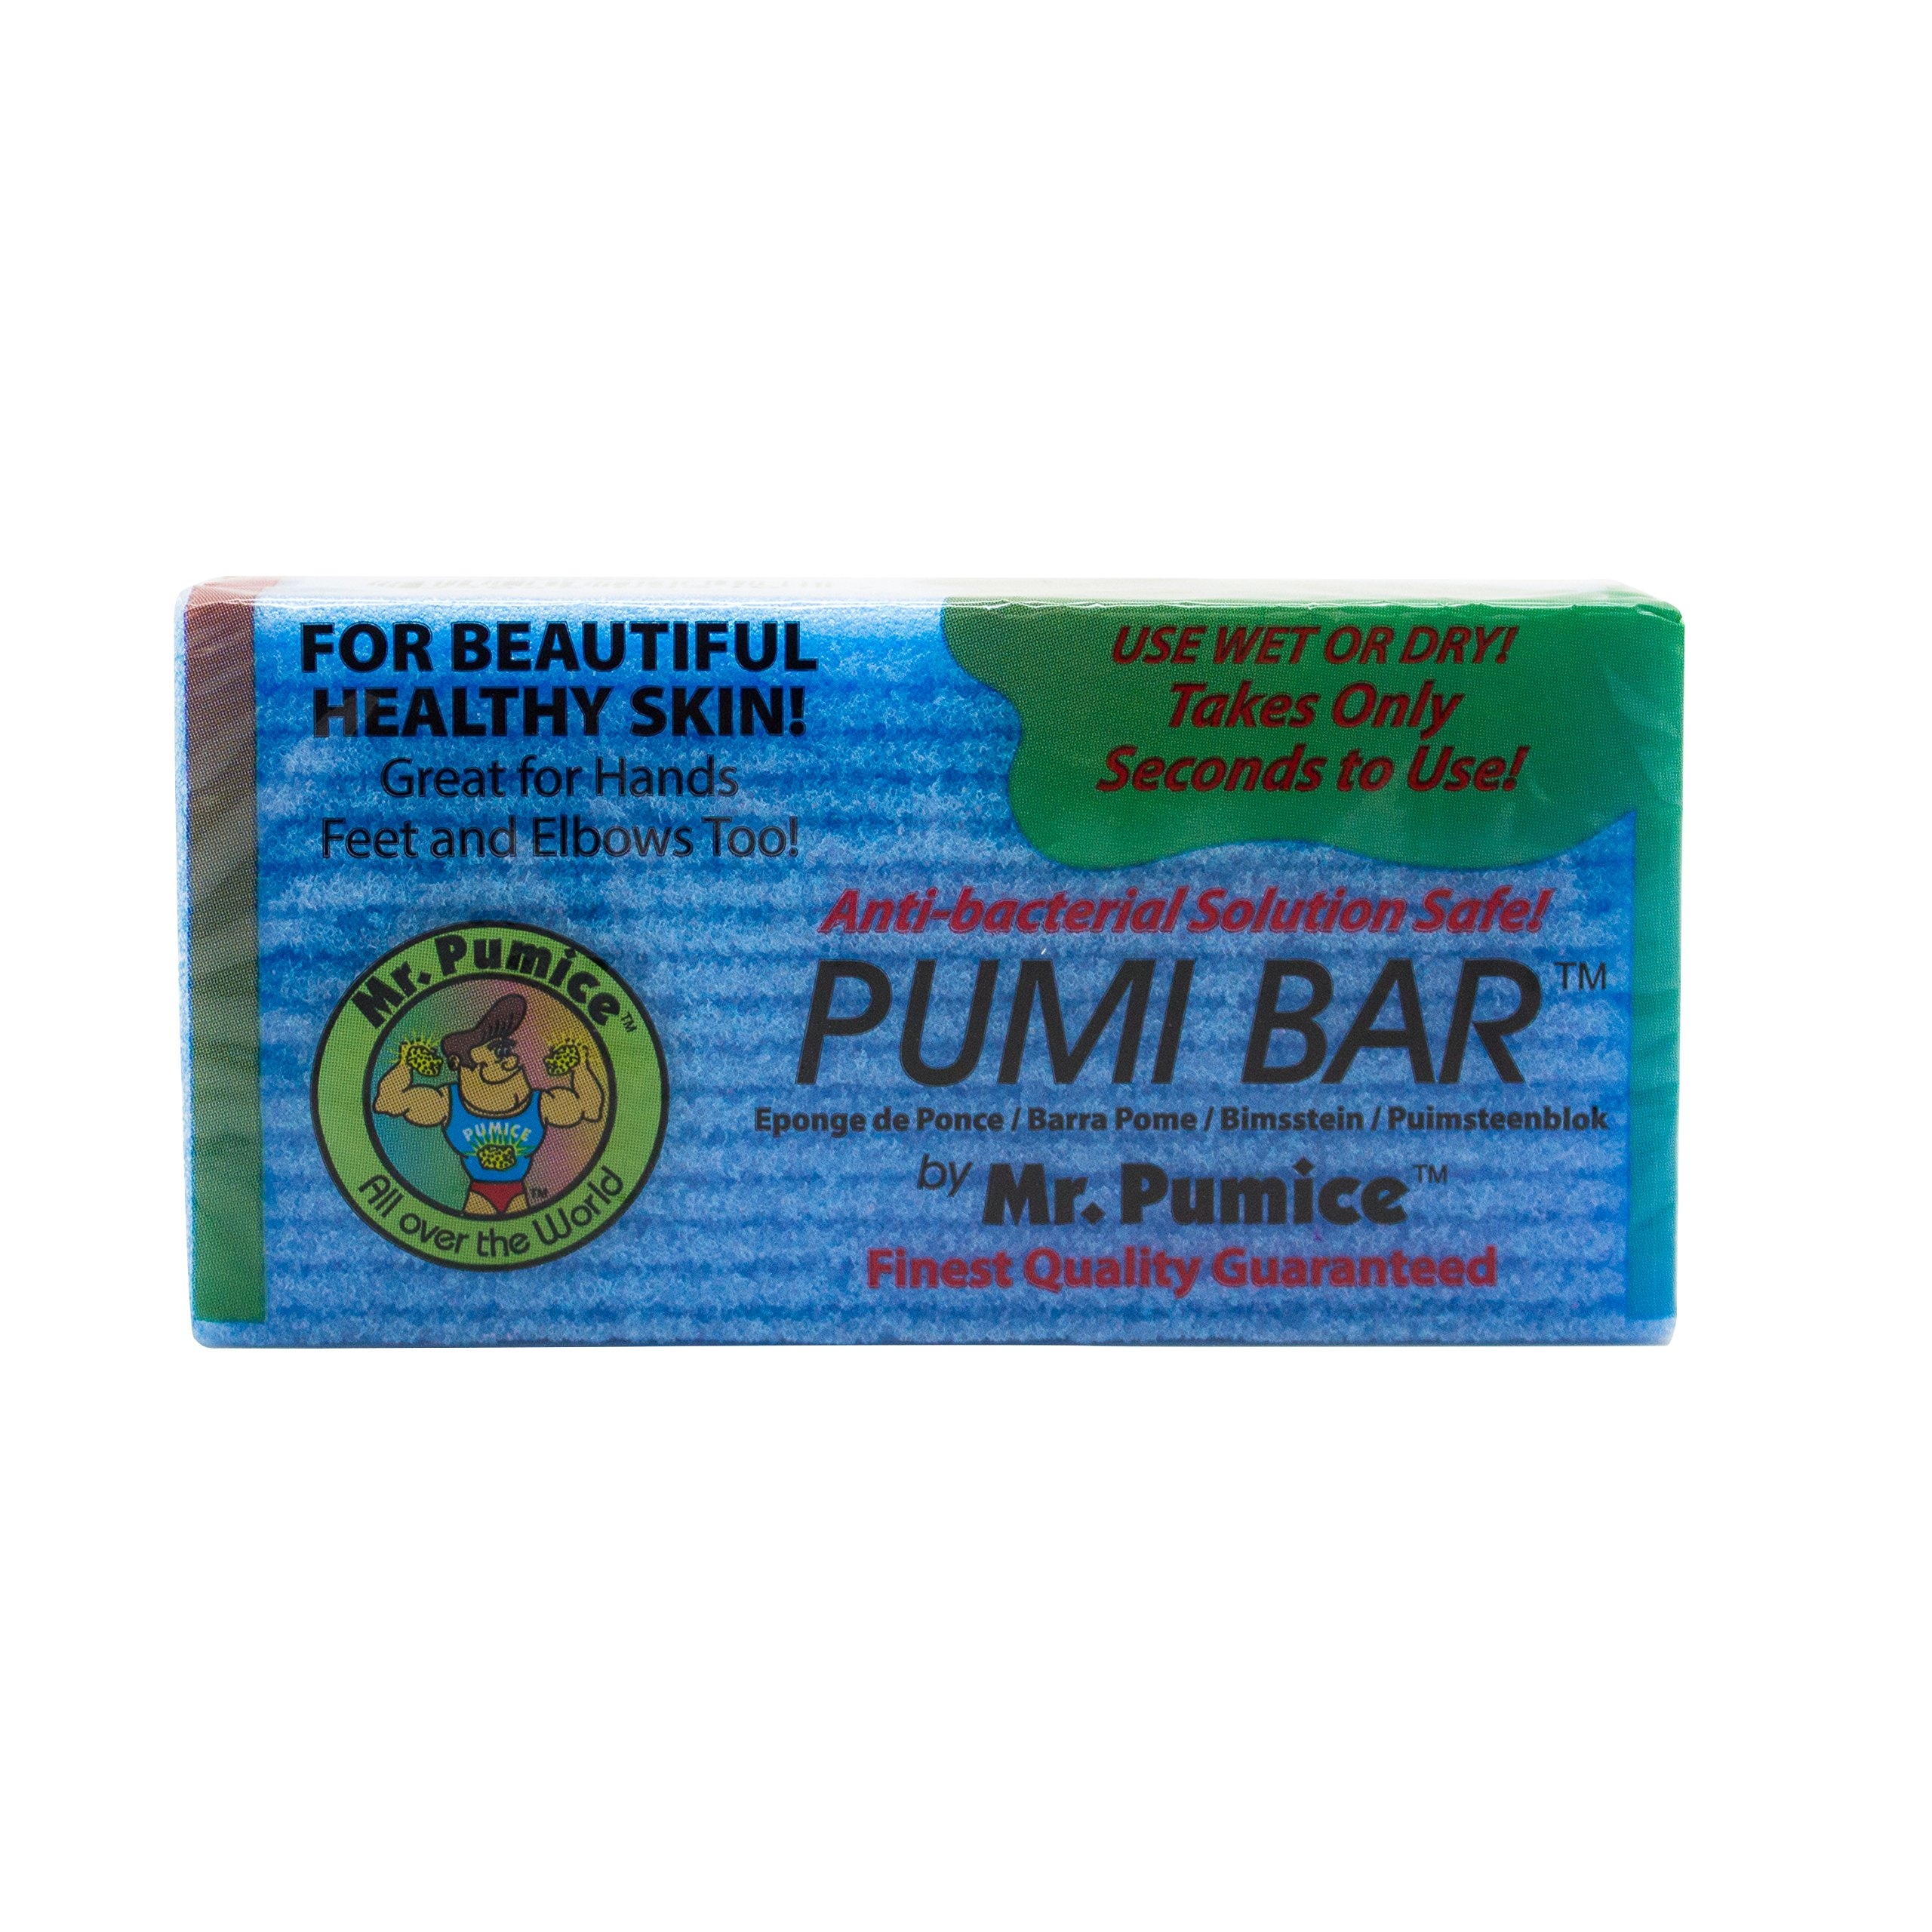 Mr. Pumice Callus Remover Pumi Bar: Pedicure Stone & Foot Scrubber - Medium Grit (6 Pack, Assorted Colors)